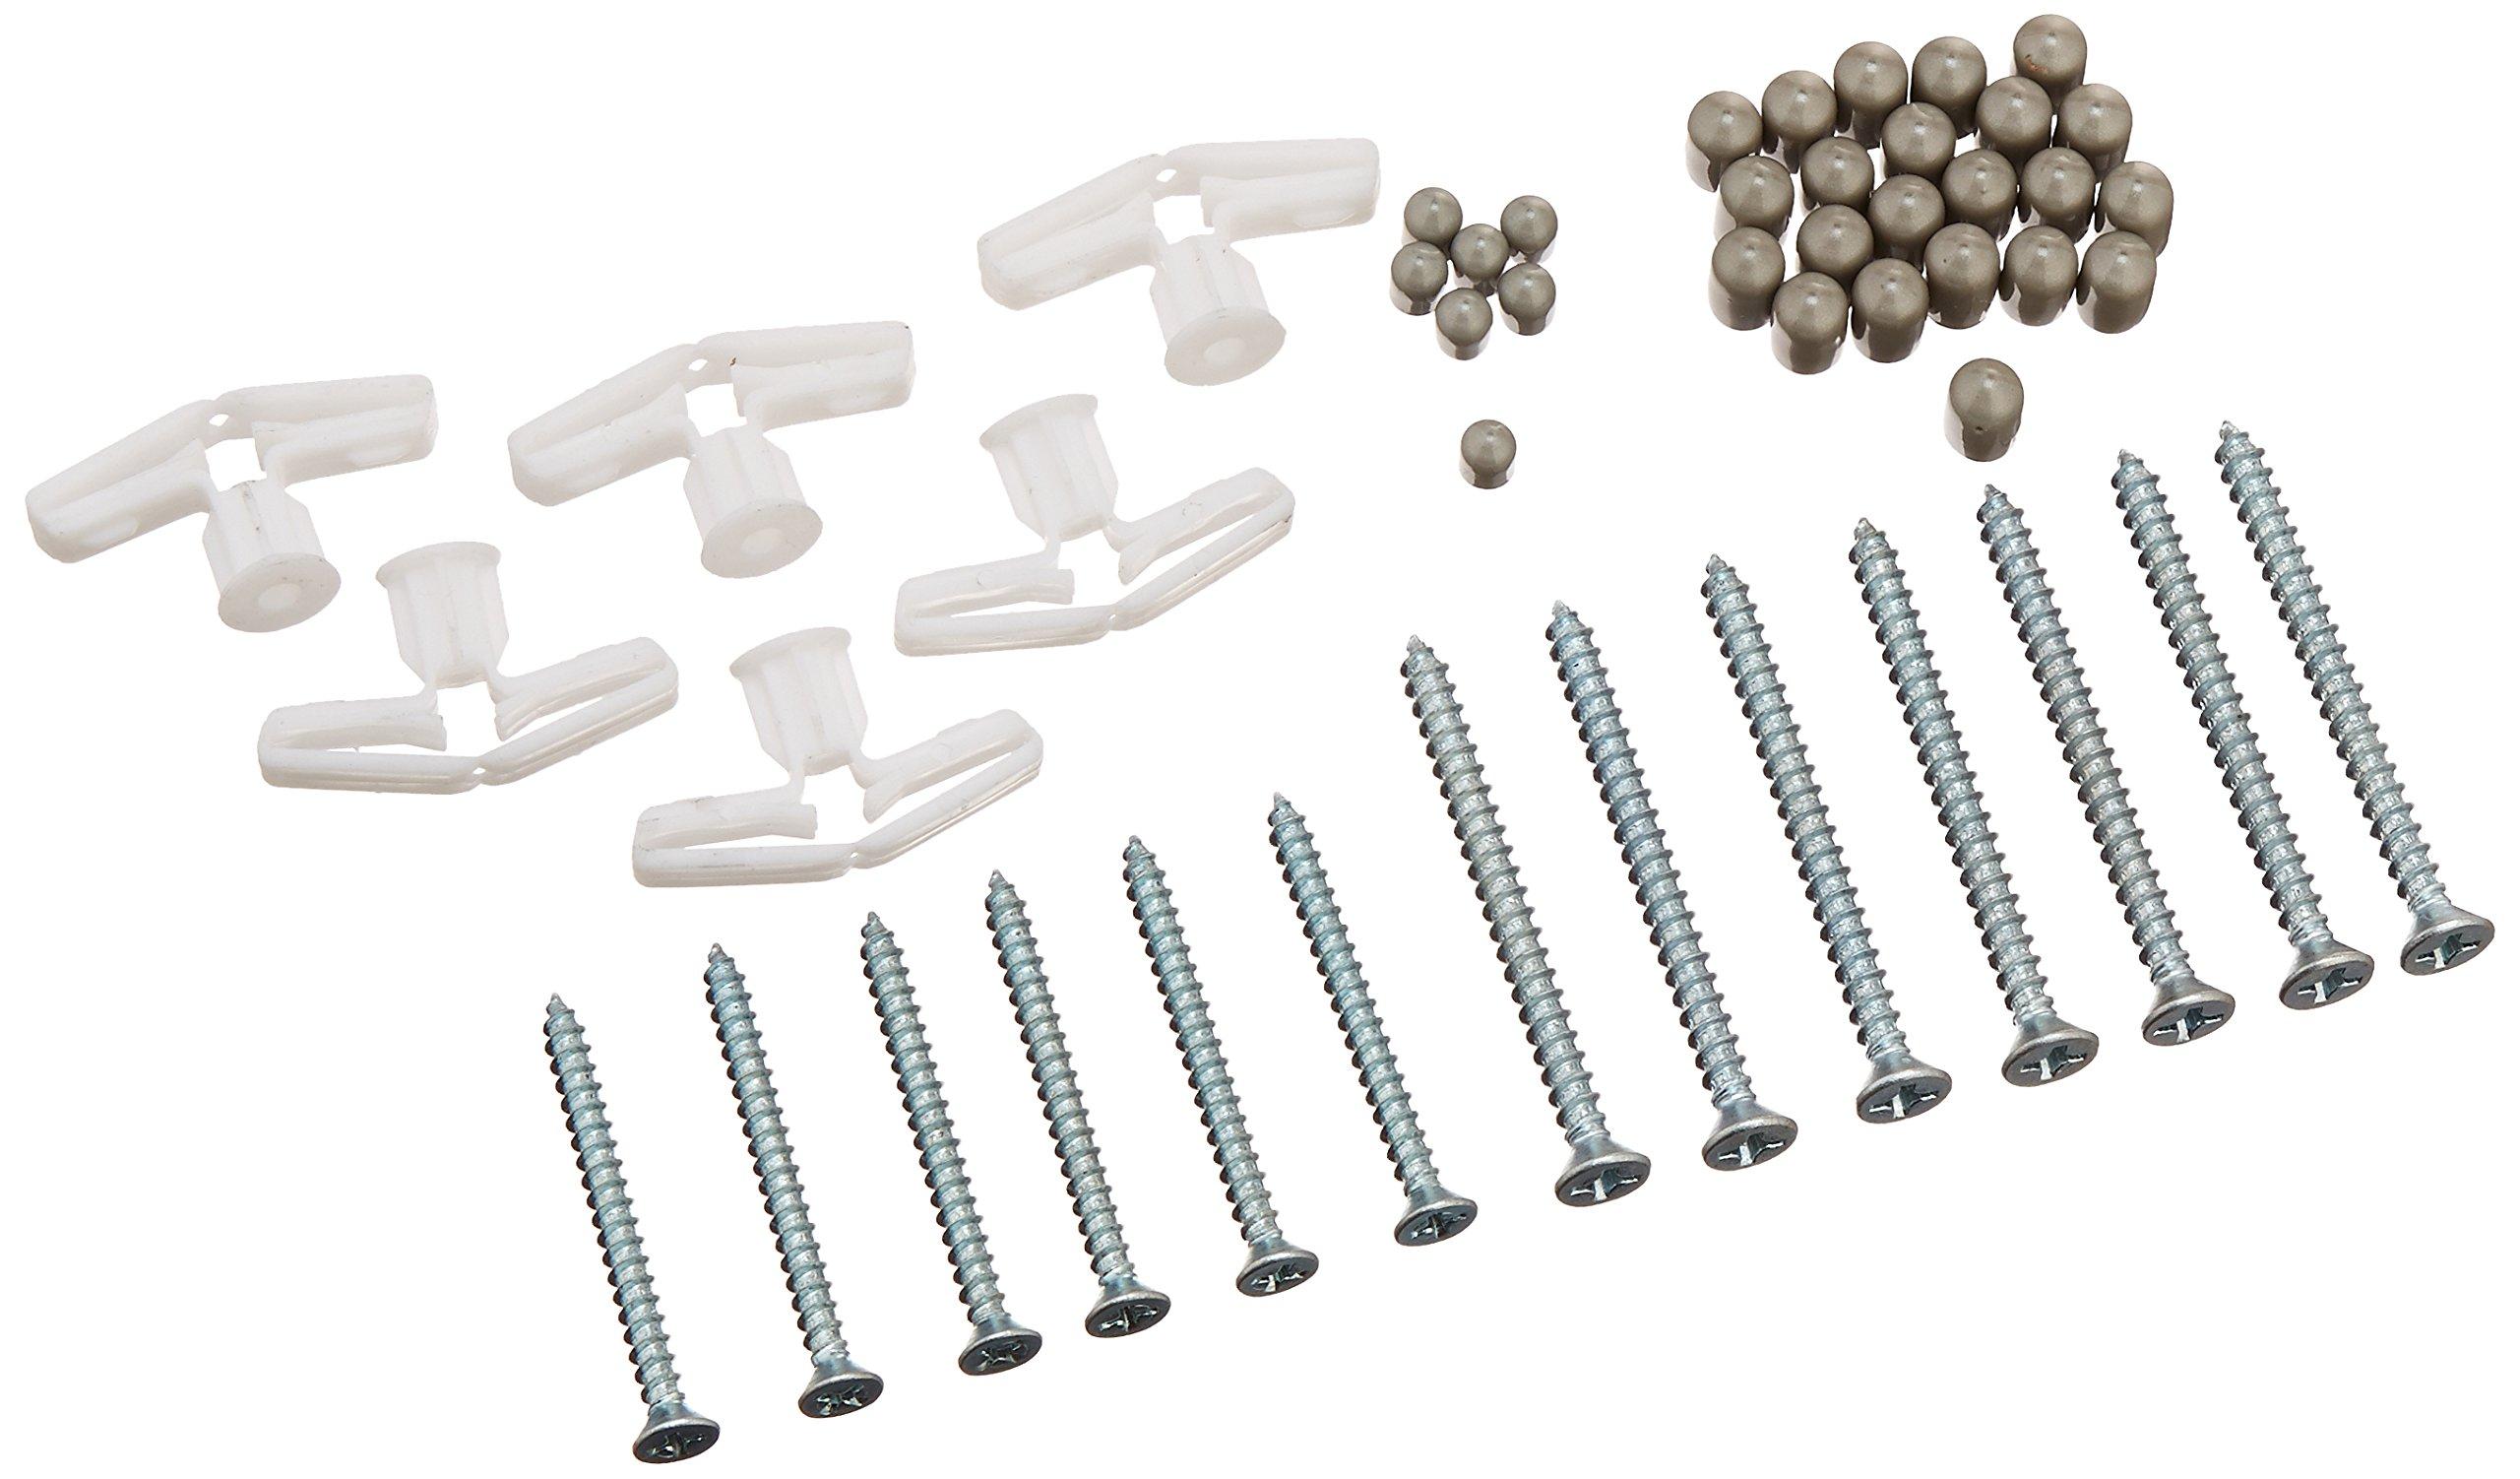 Rubbermaid Fast Track Adjustable Closet System Hardware Kit, Satin Nickel (1791597)